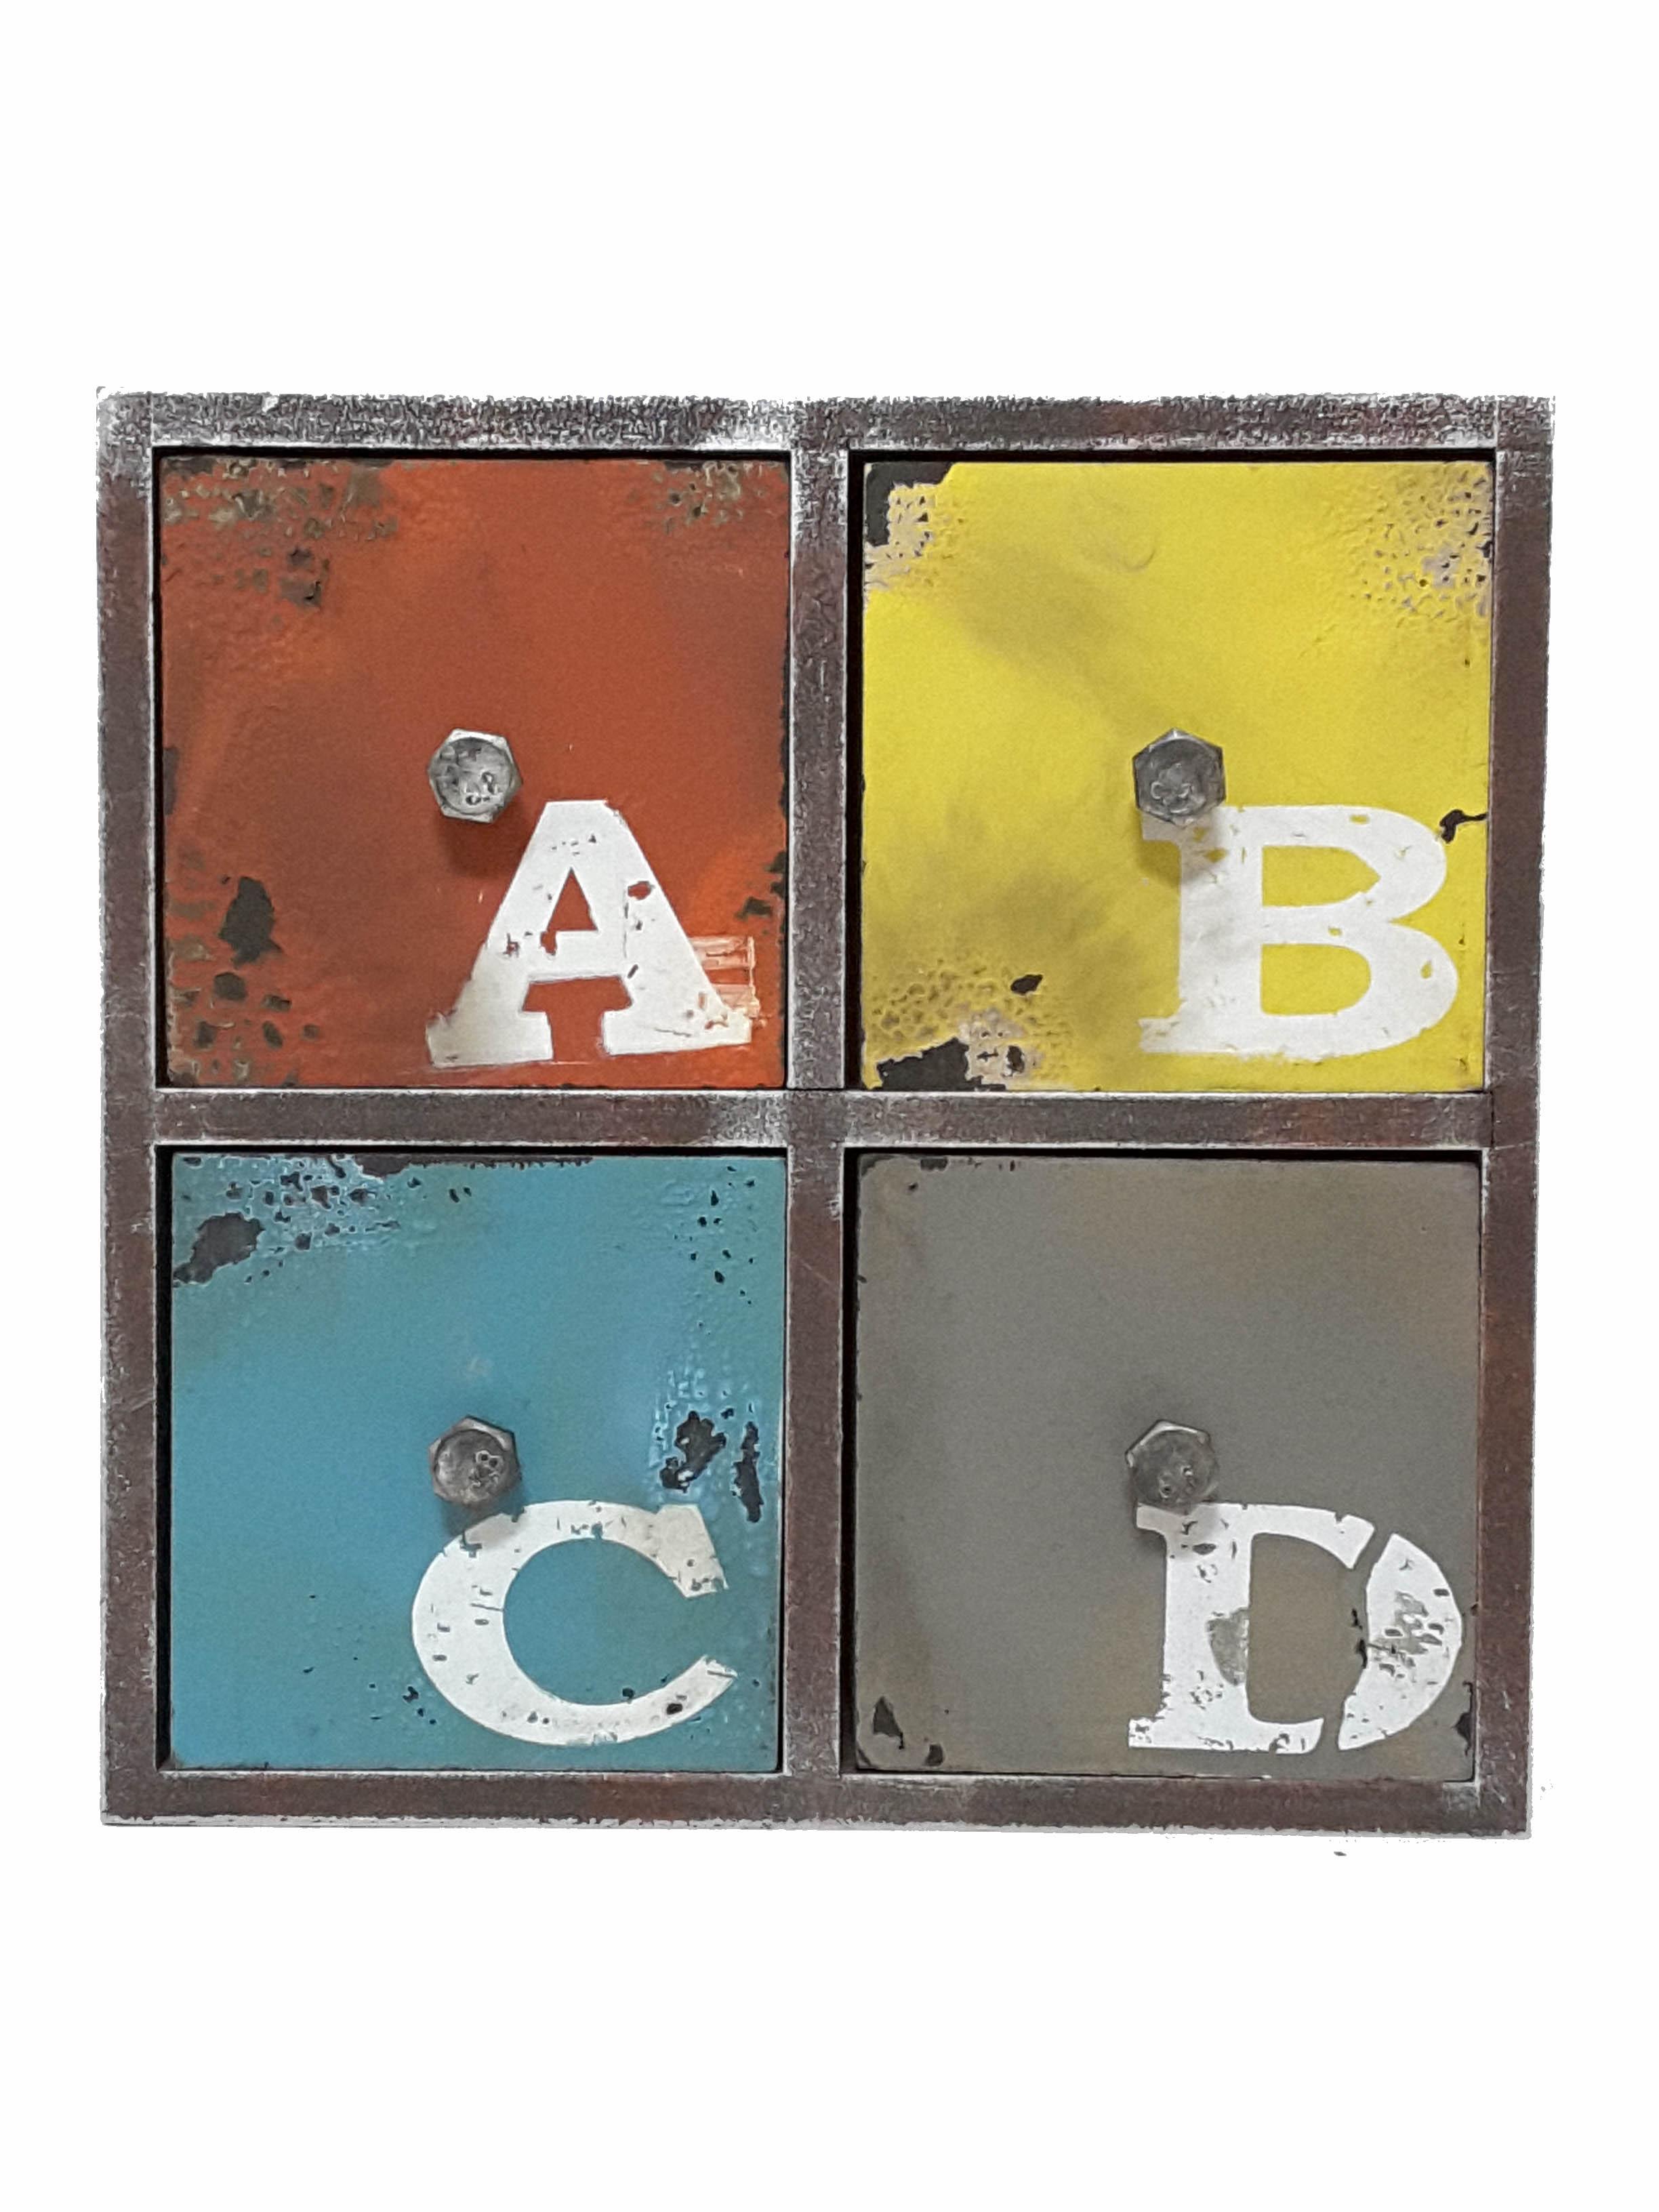 La maison生活小舖《工藝風鐵製四格抽屜櫃》ABC彩色圖案 收納物品 裝飾環境 實用美觀 收納櫃/抽屜櫃/置物櫃/復古擺飾/工蓺風